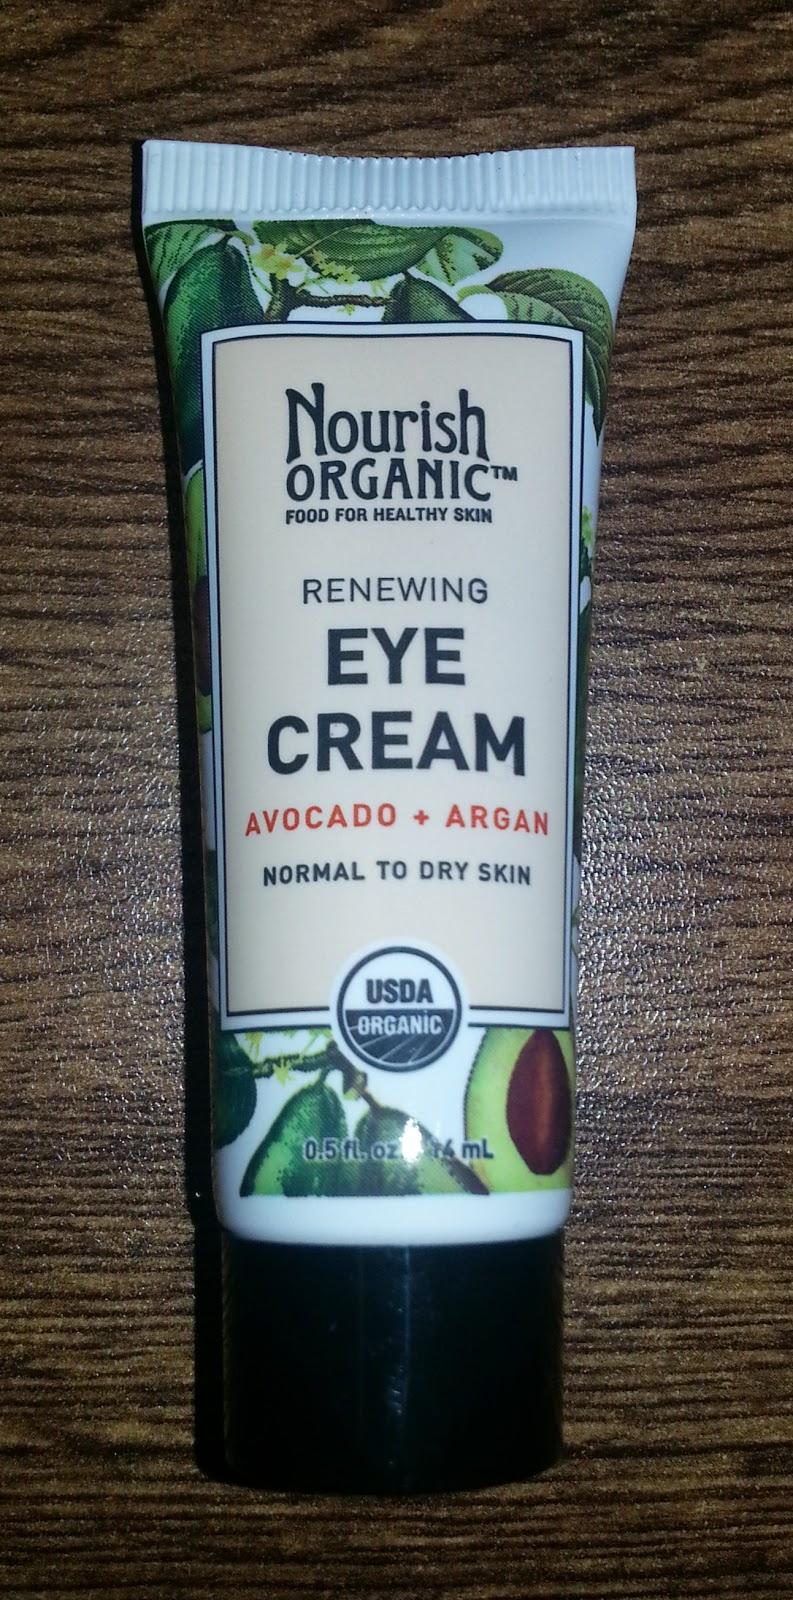 Nourish Organic Renewing Eye Cream